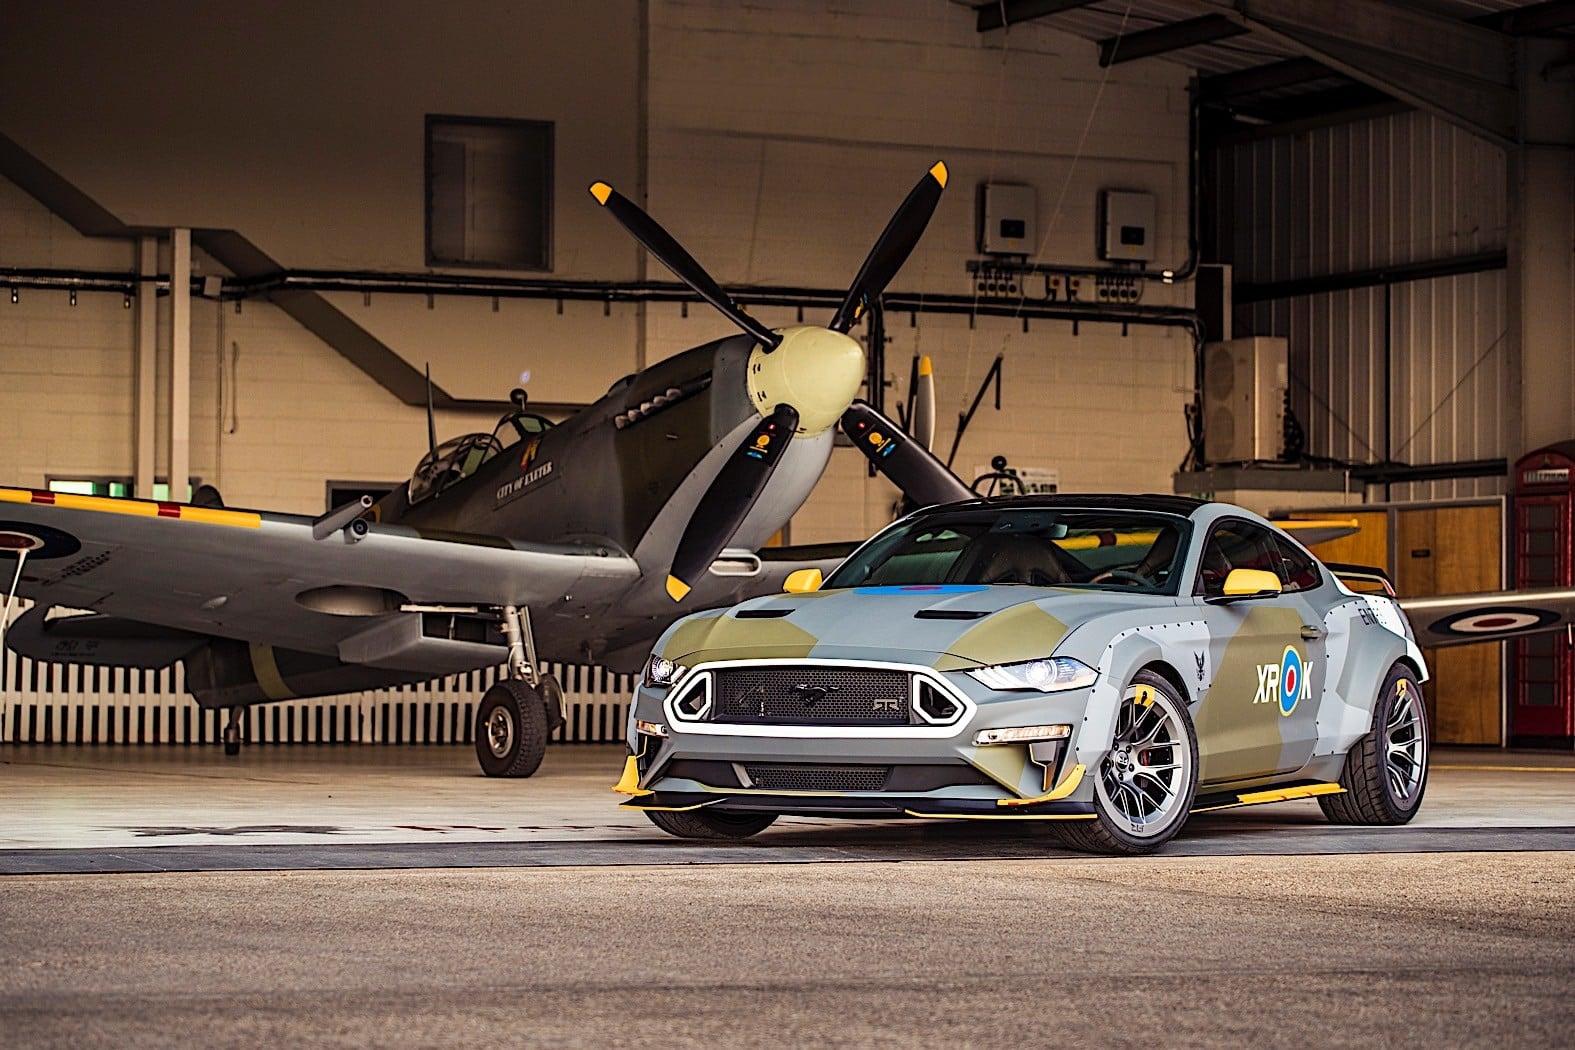 Ford Mustang Gt Wallpaper >> Ford Mustang GT Eagle Squadron edición especial